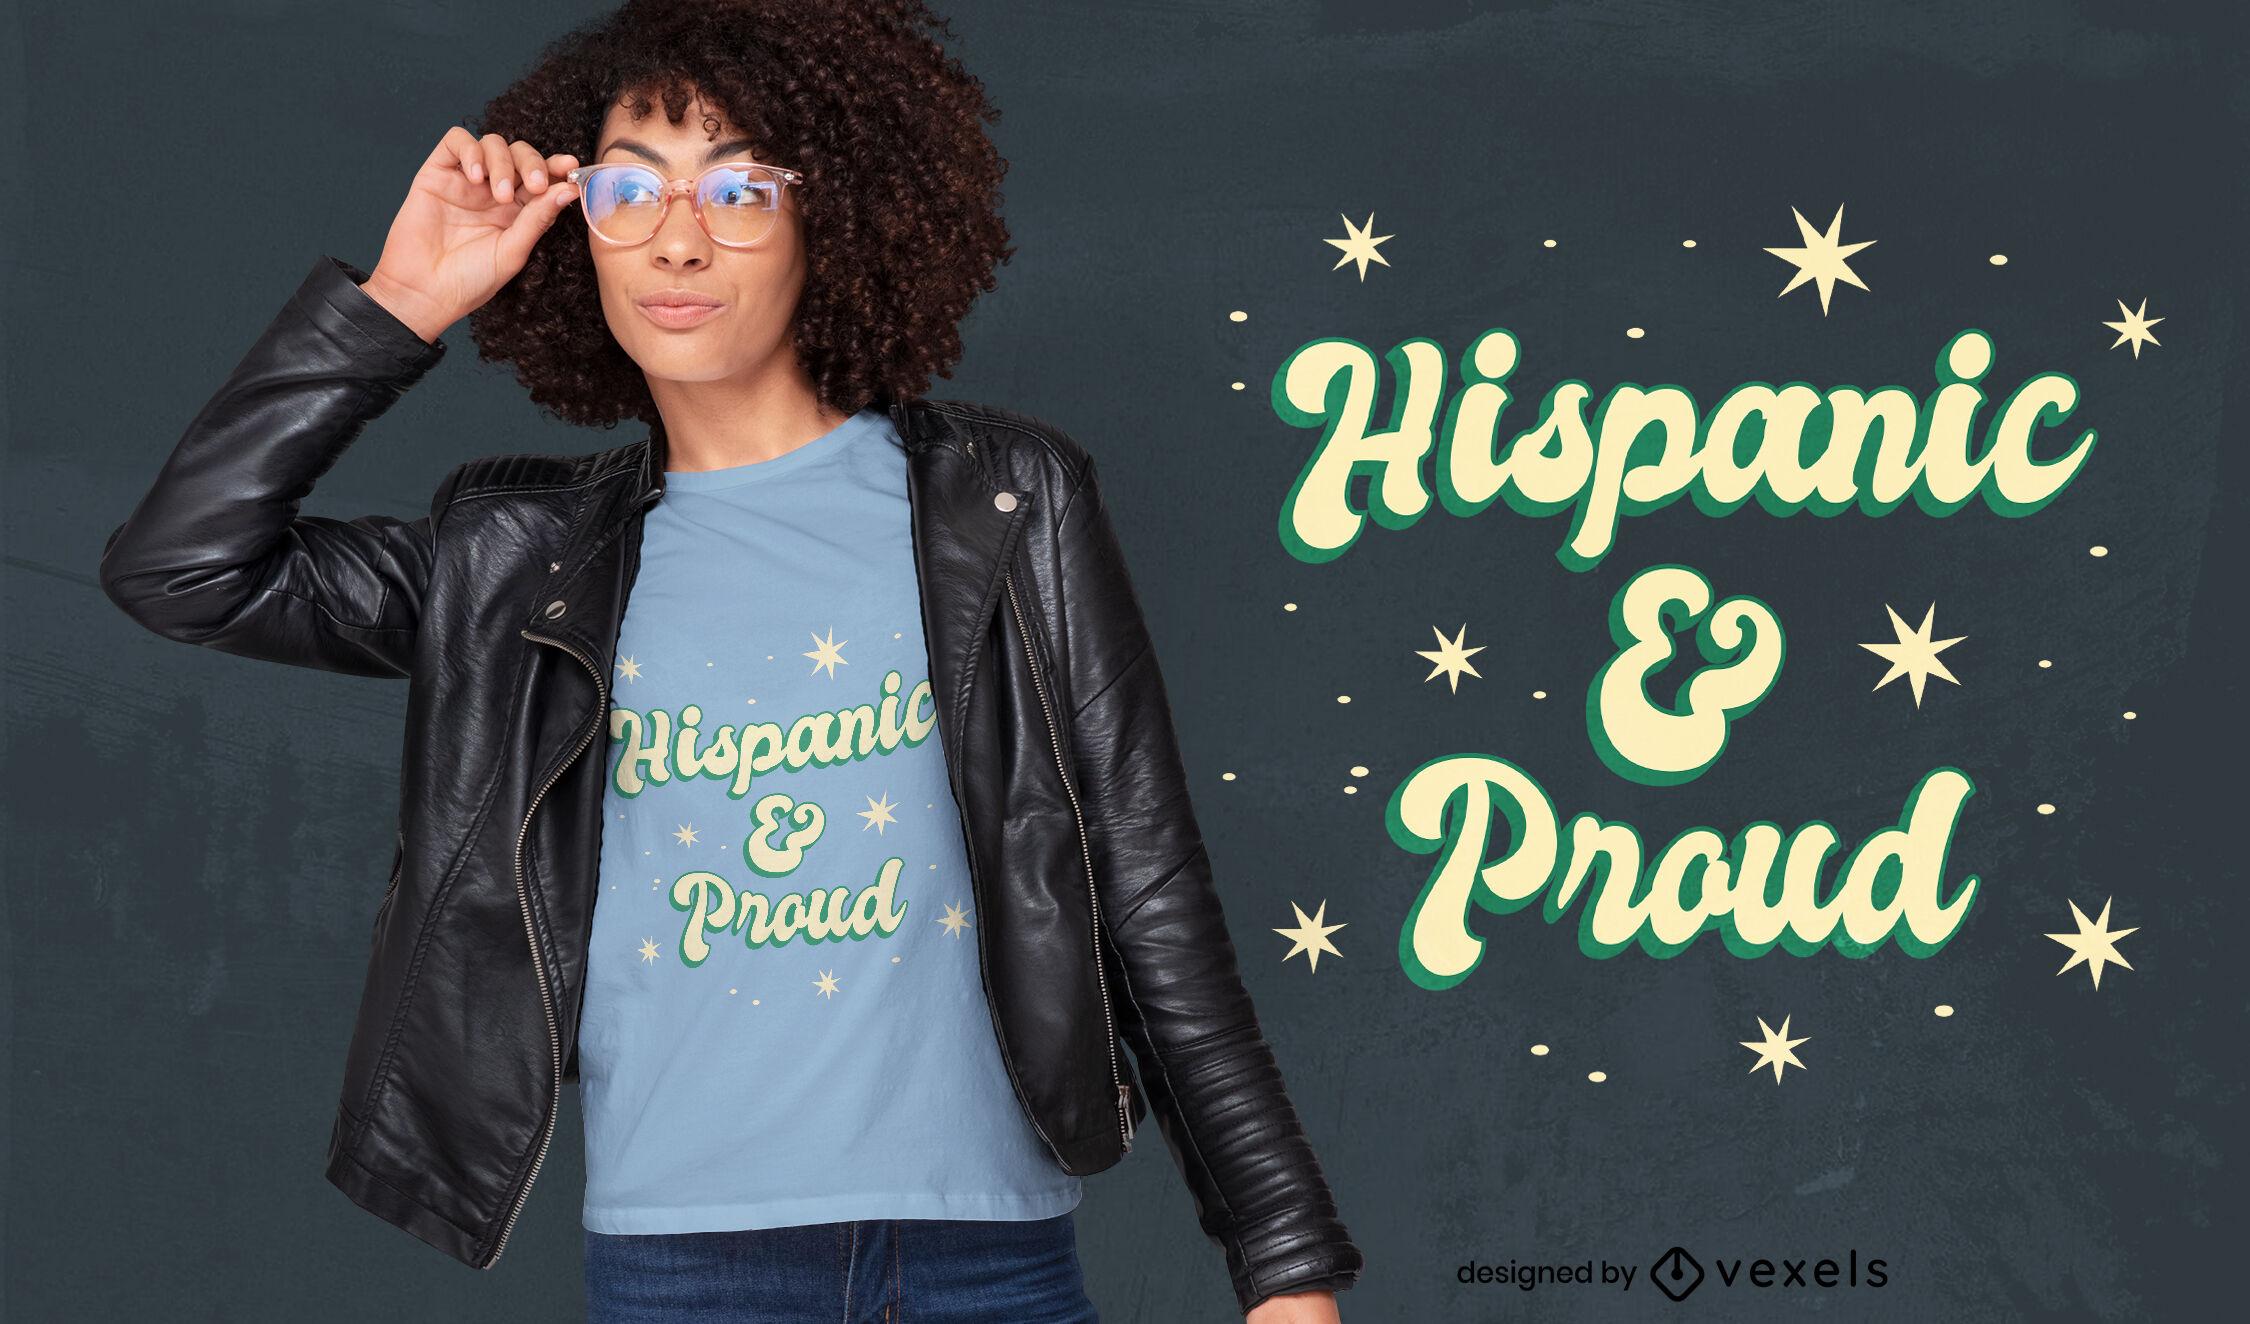 Hispanic & proud quote t-shirt design